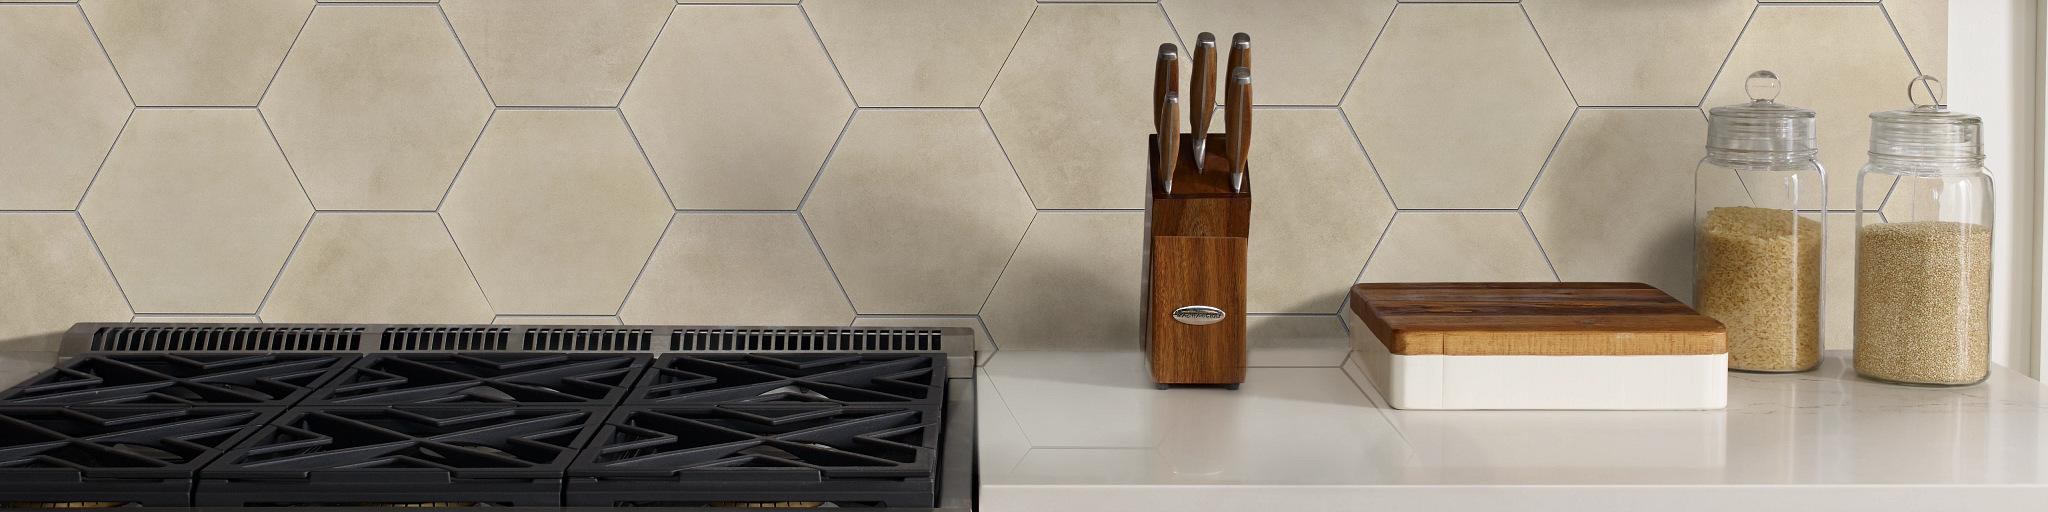 Tile-and-Stone-Backsplash-Revival-Hexagon-327TS-00200-Sand-Kitchen-2020